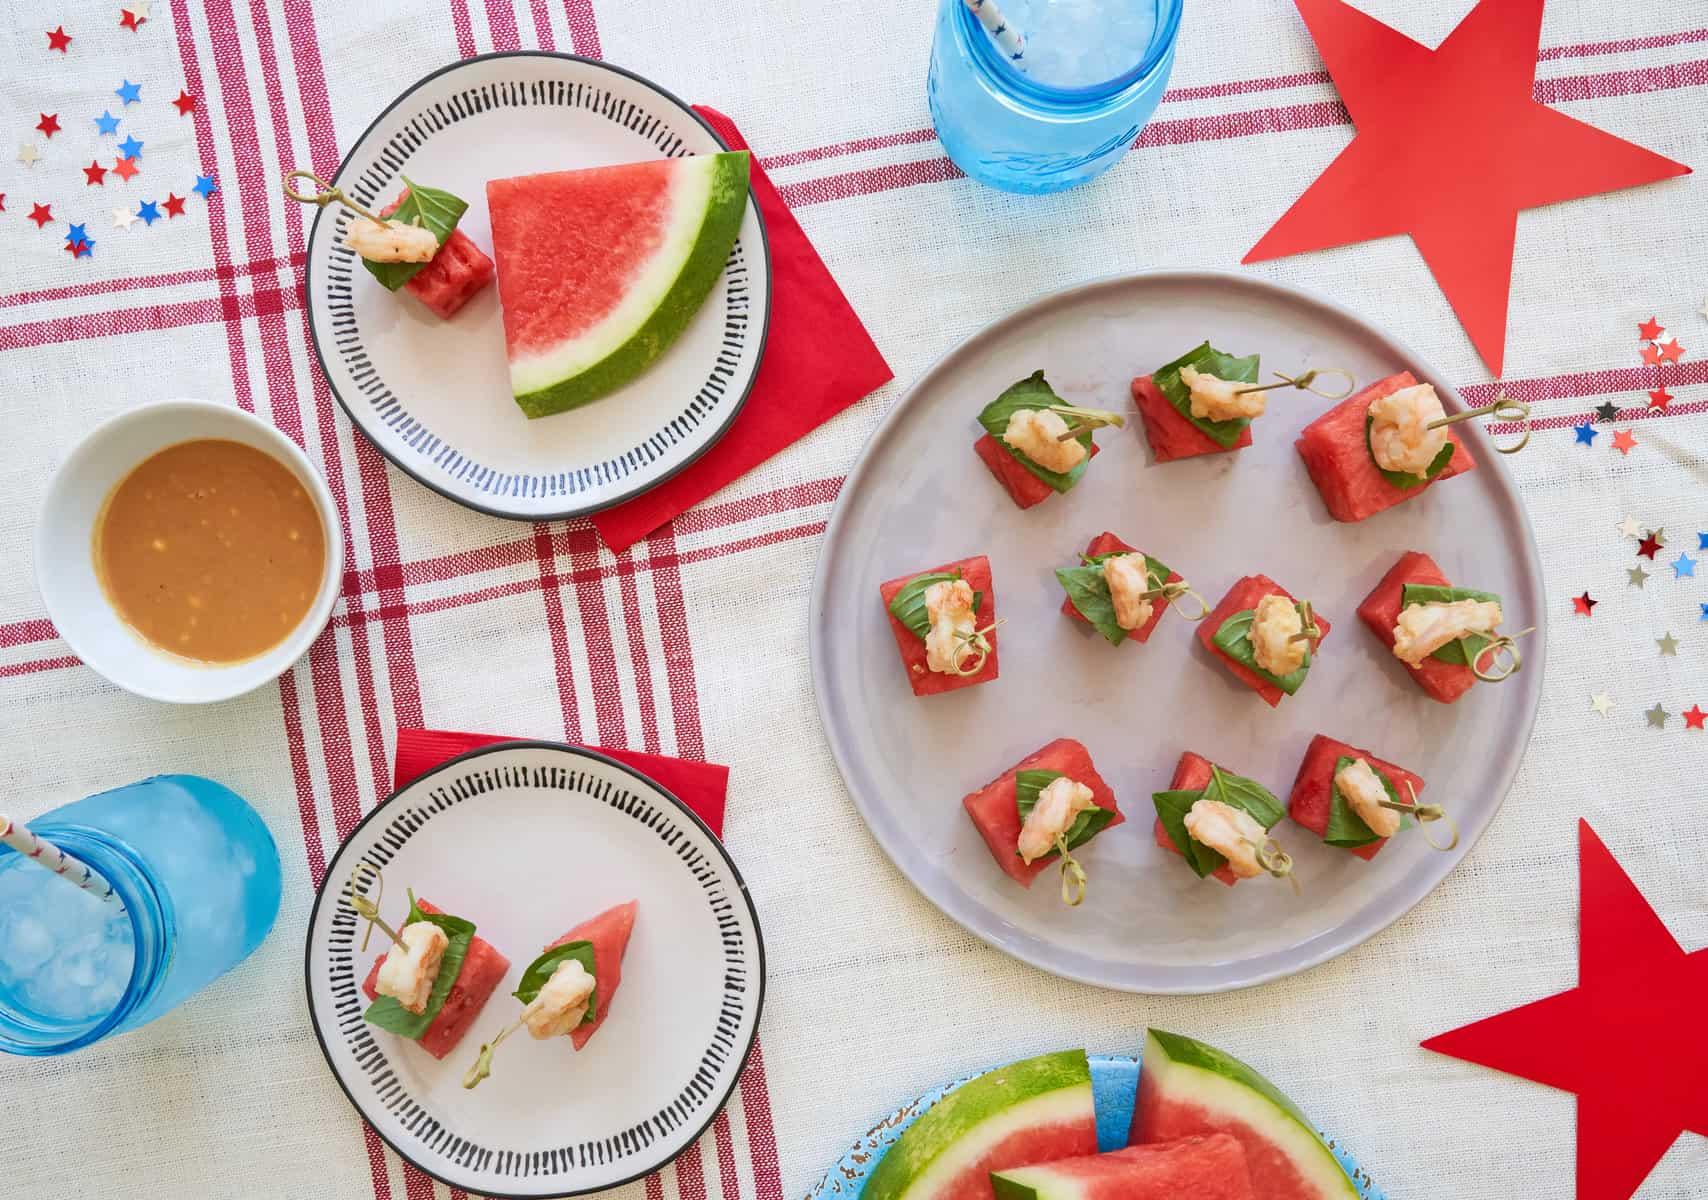 Watermelon & Shrimp Cocktail Skewers